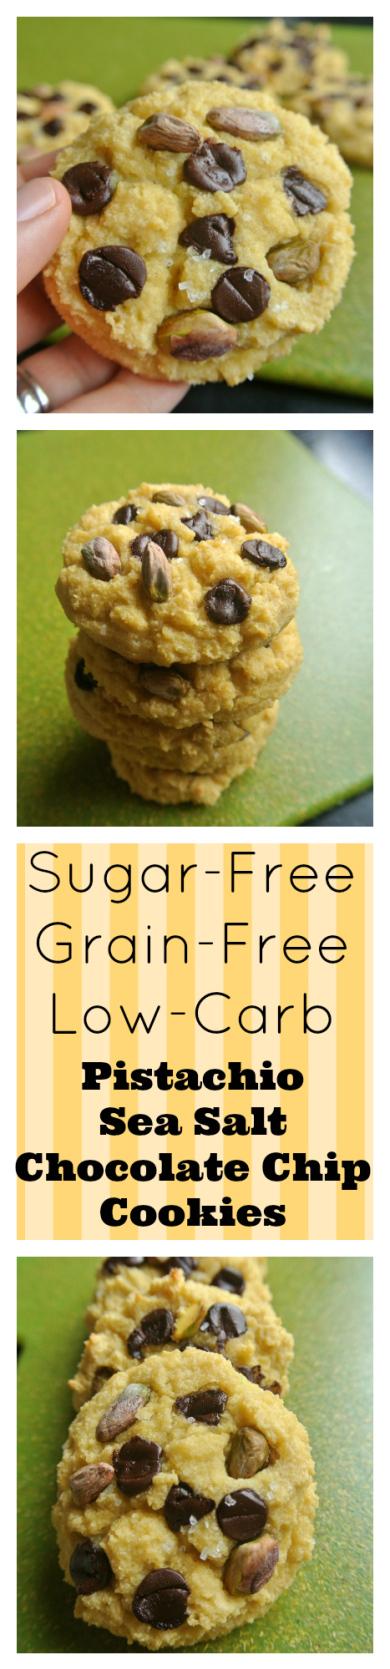 Sugar-Free Grain-Free Low-Carb Pistachio Sea Salt Chocolate Chip Cookies